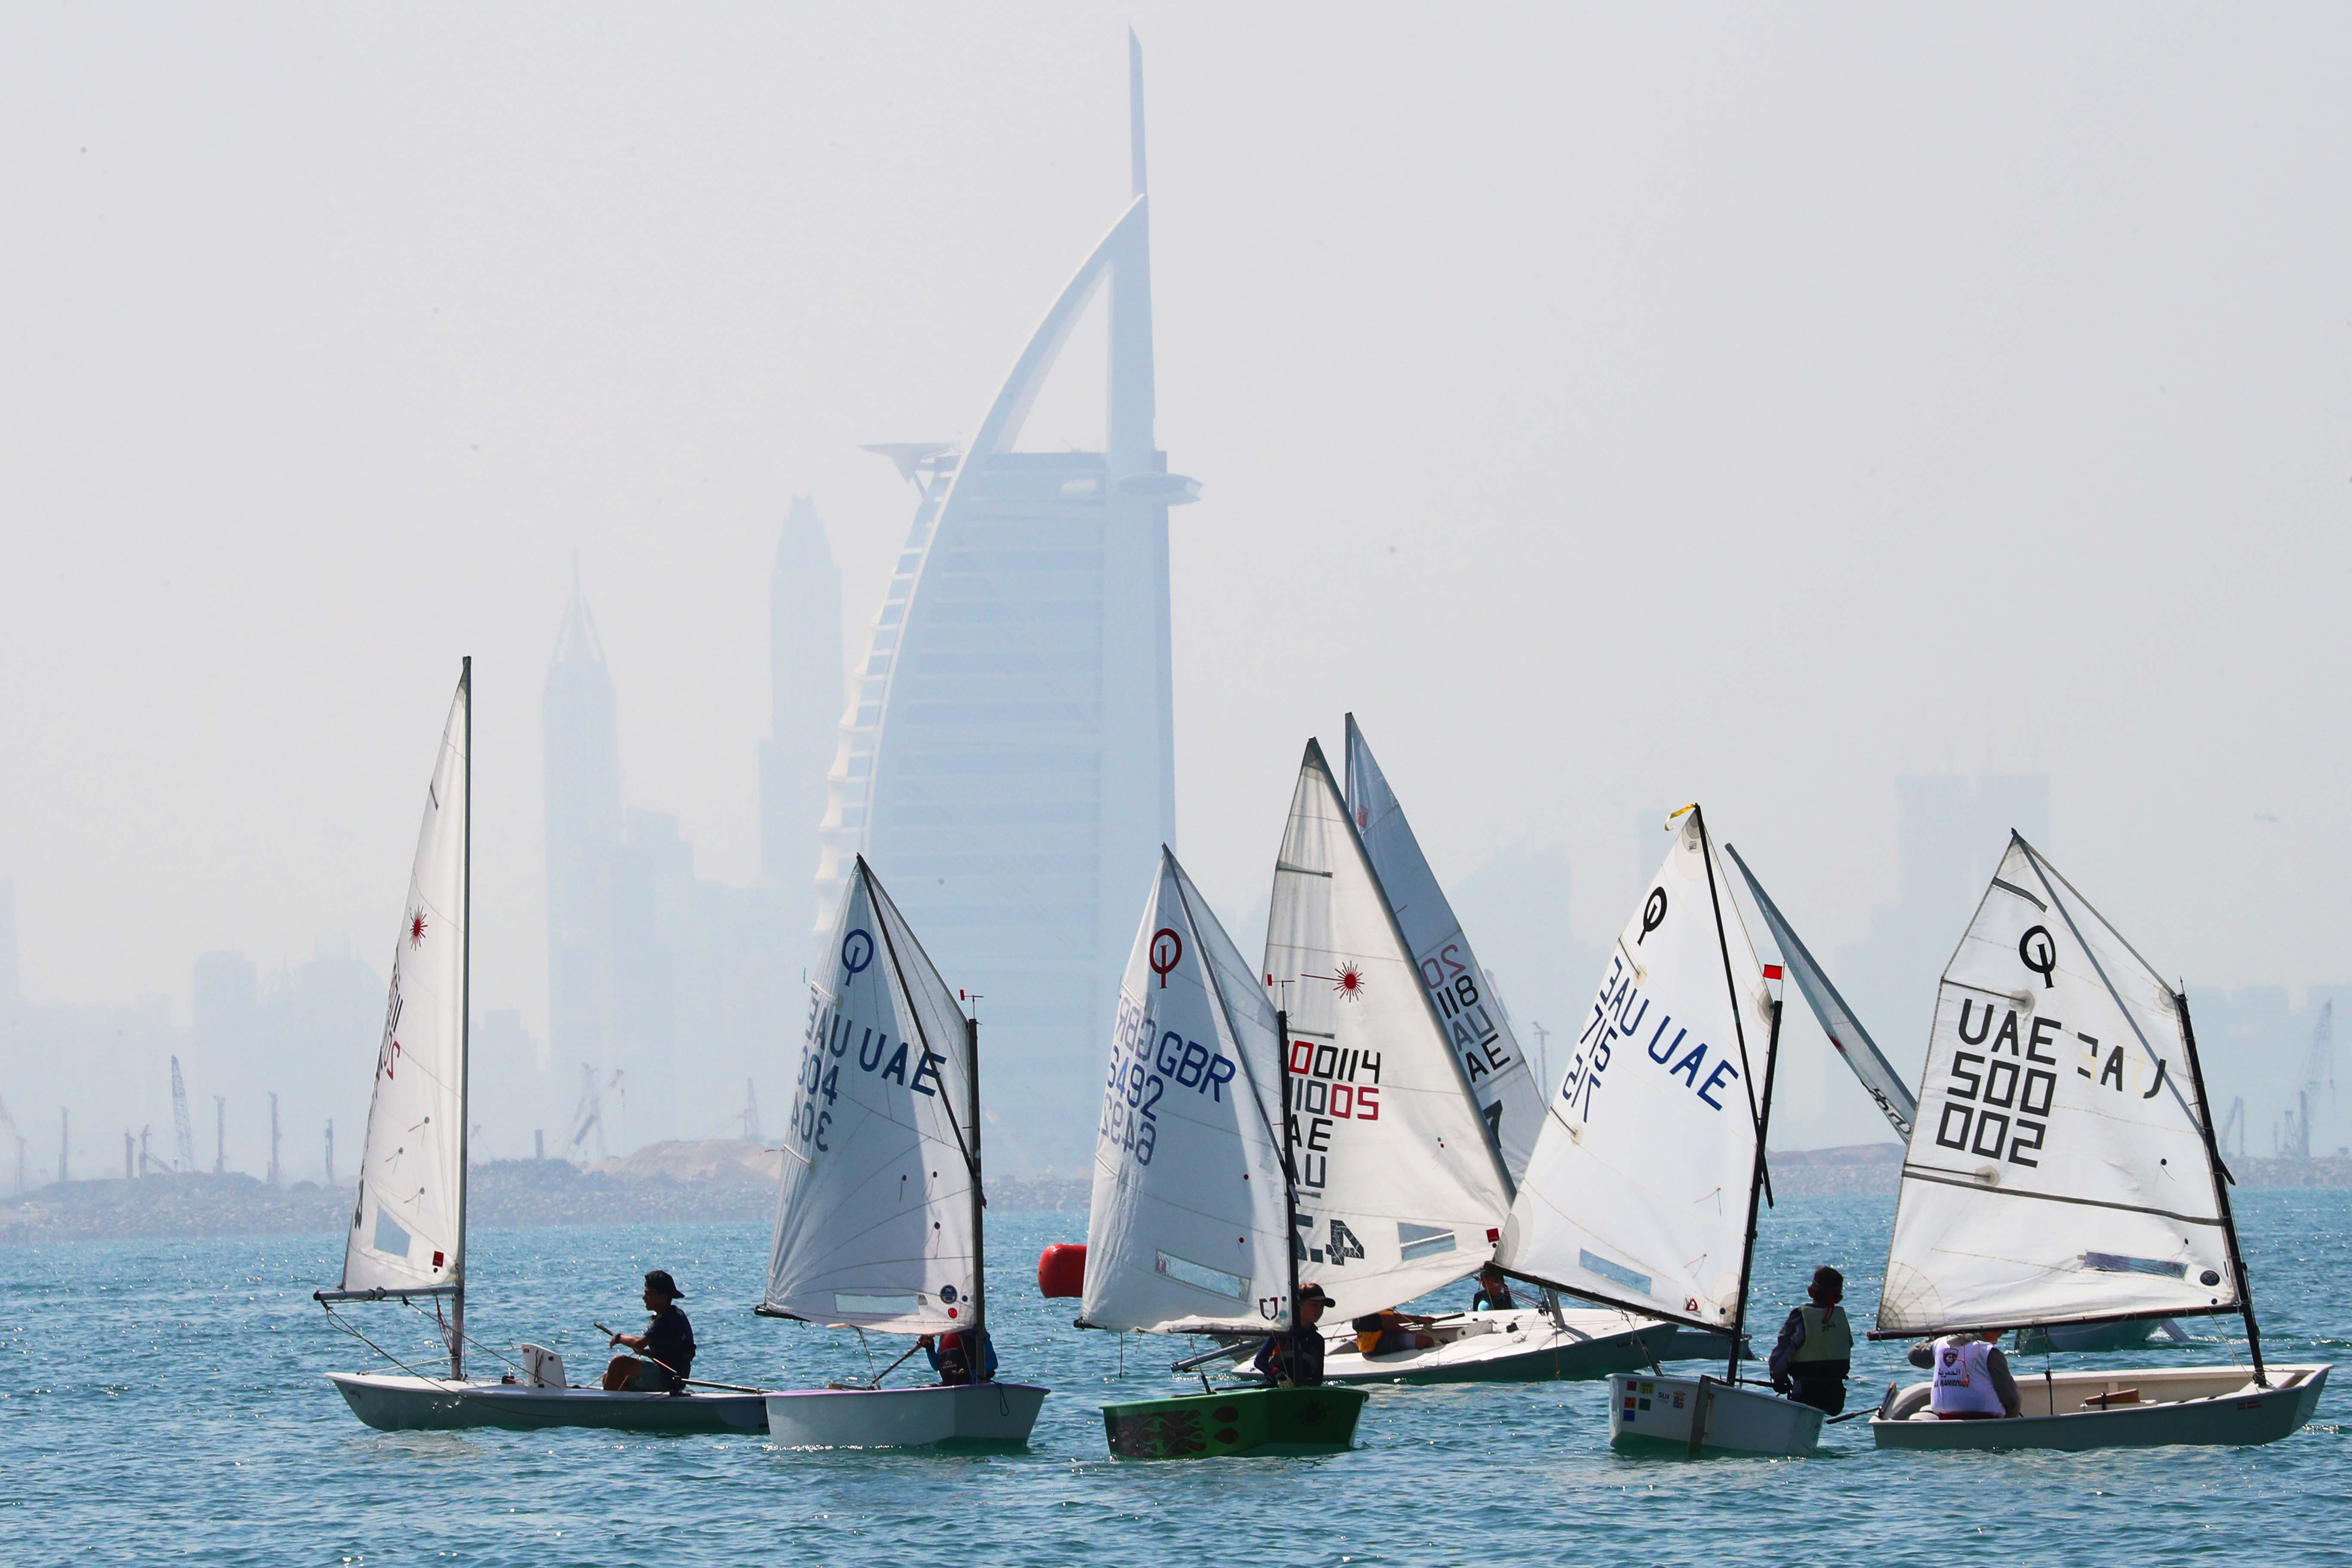 First Round of Dubai Junior Regatta today